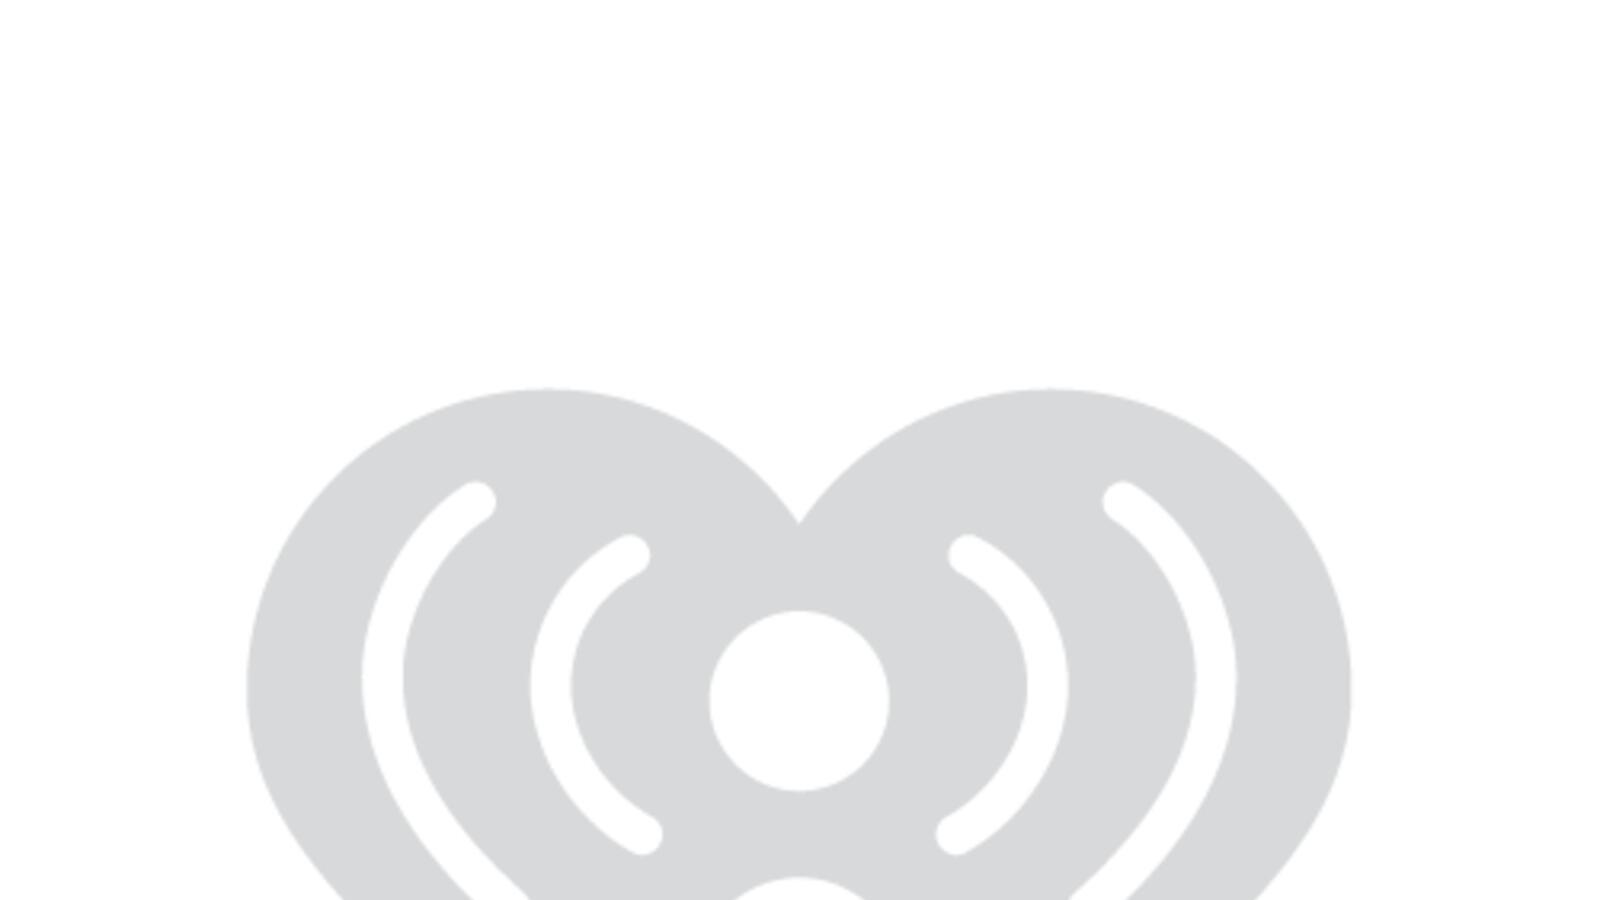 Teisha Powell - BOOK - Liberal Lies